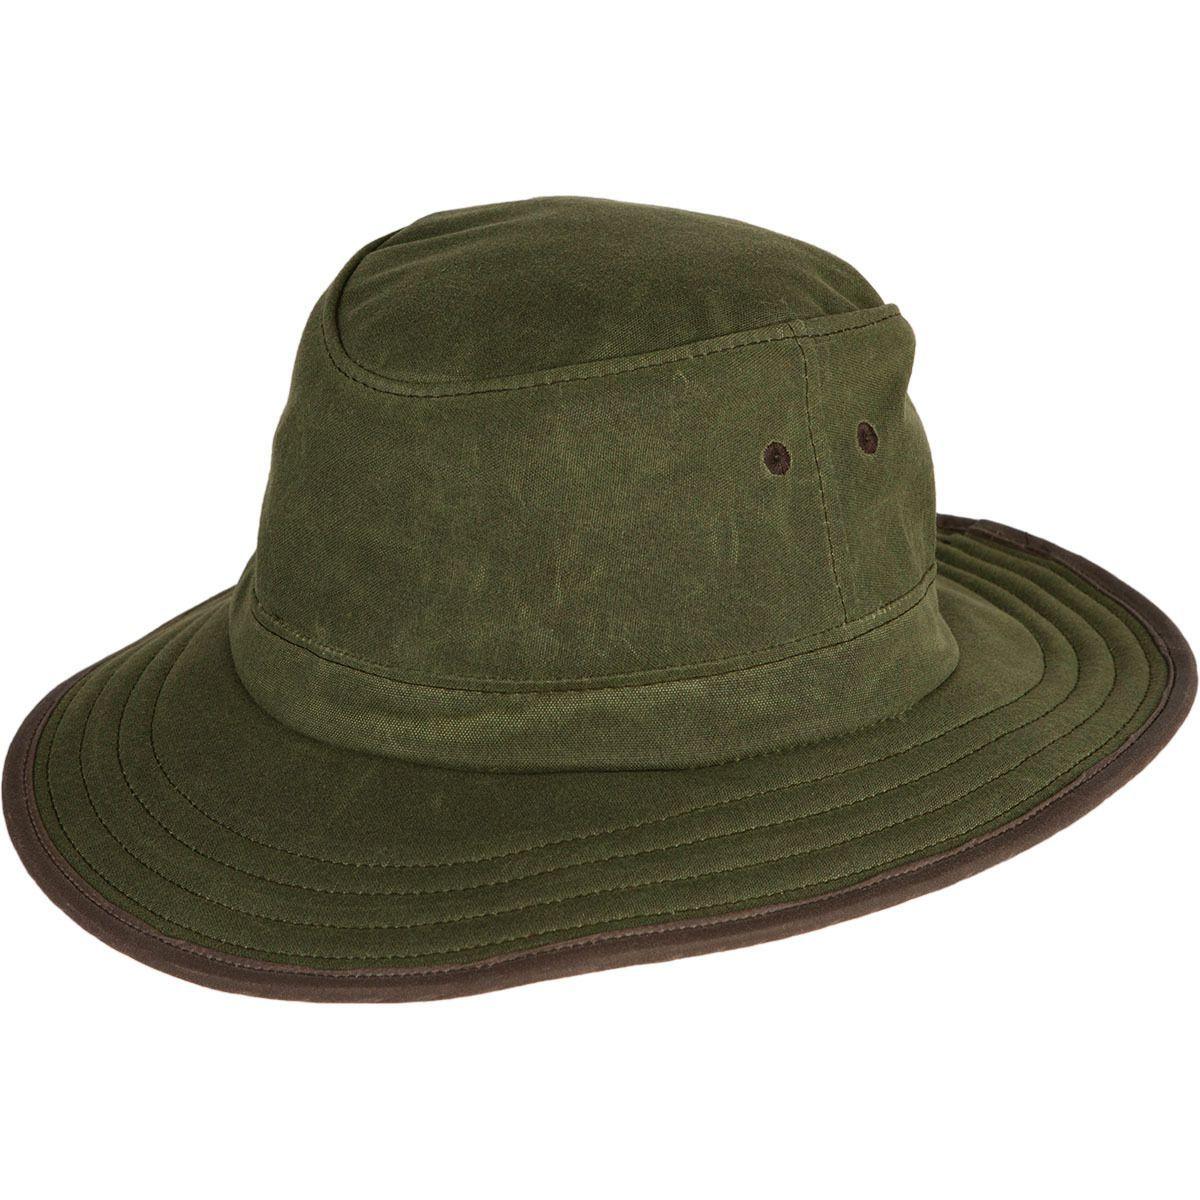 Stormy Kromer Mercantile Waxed SK Cruiser Hat - Men's